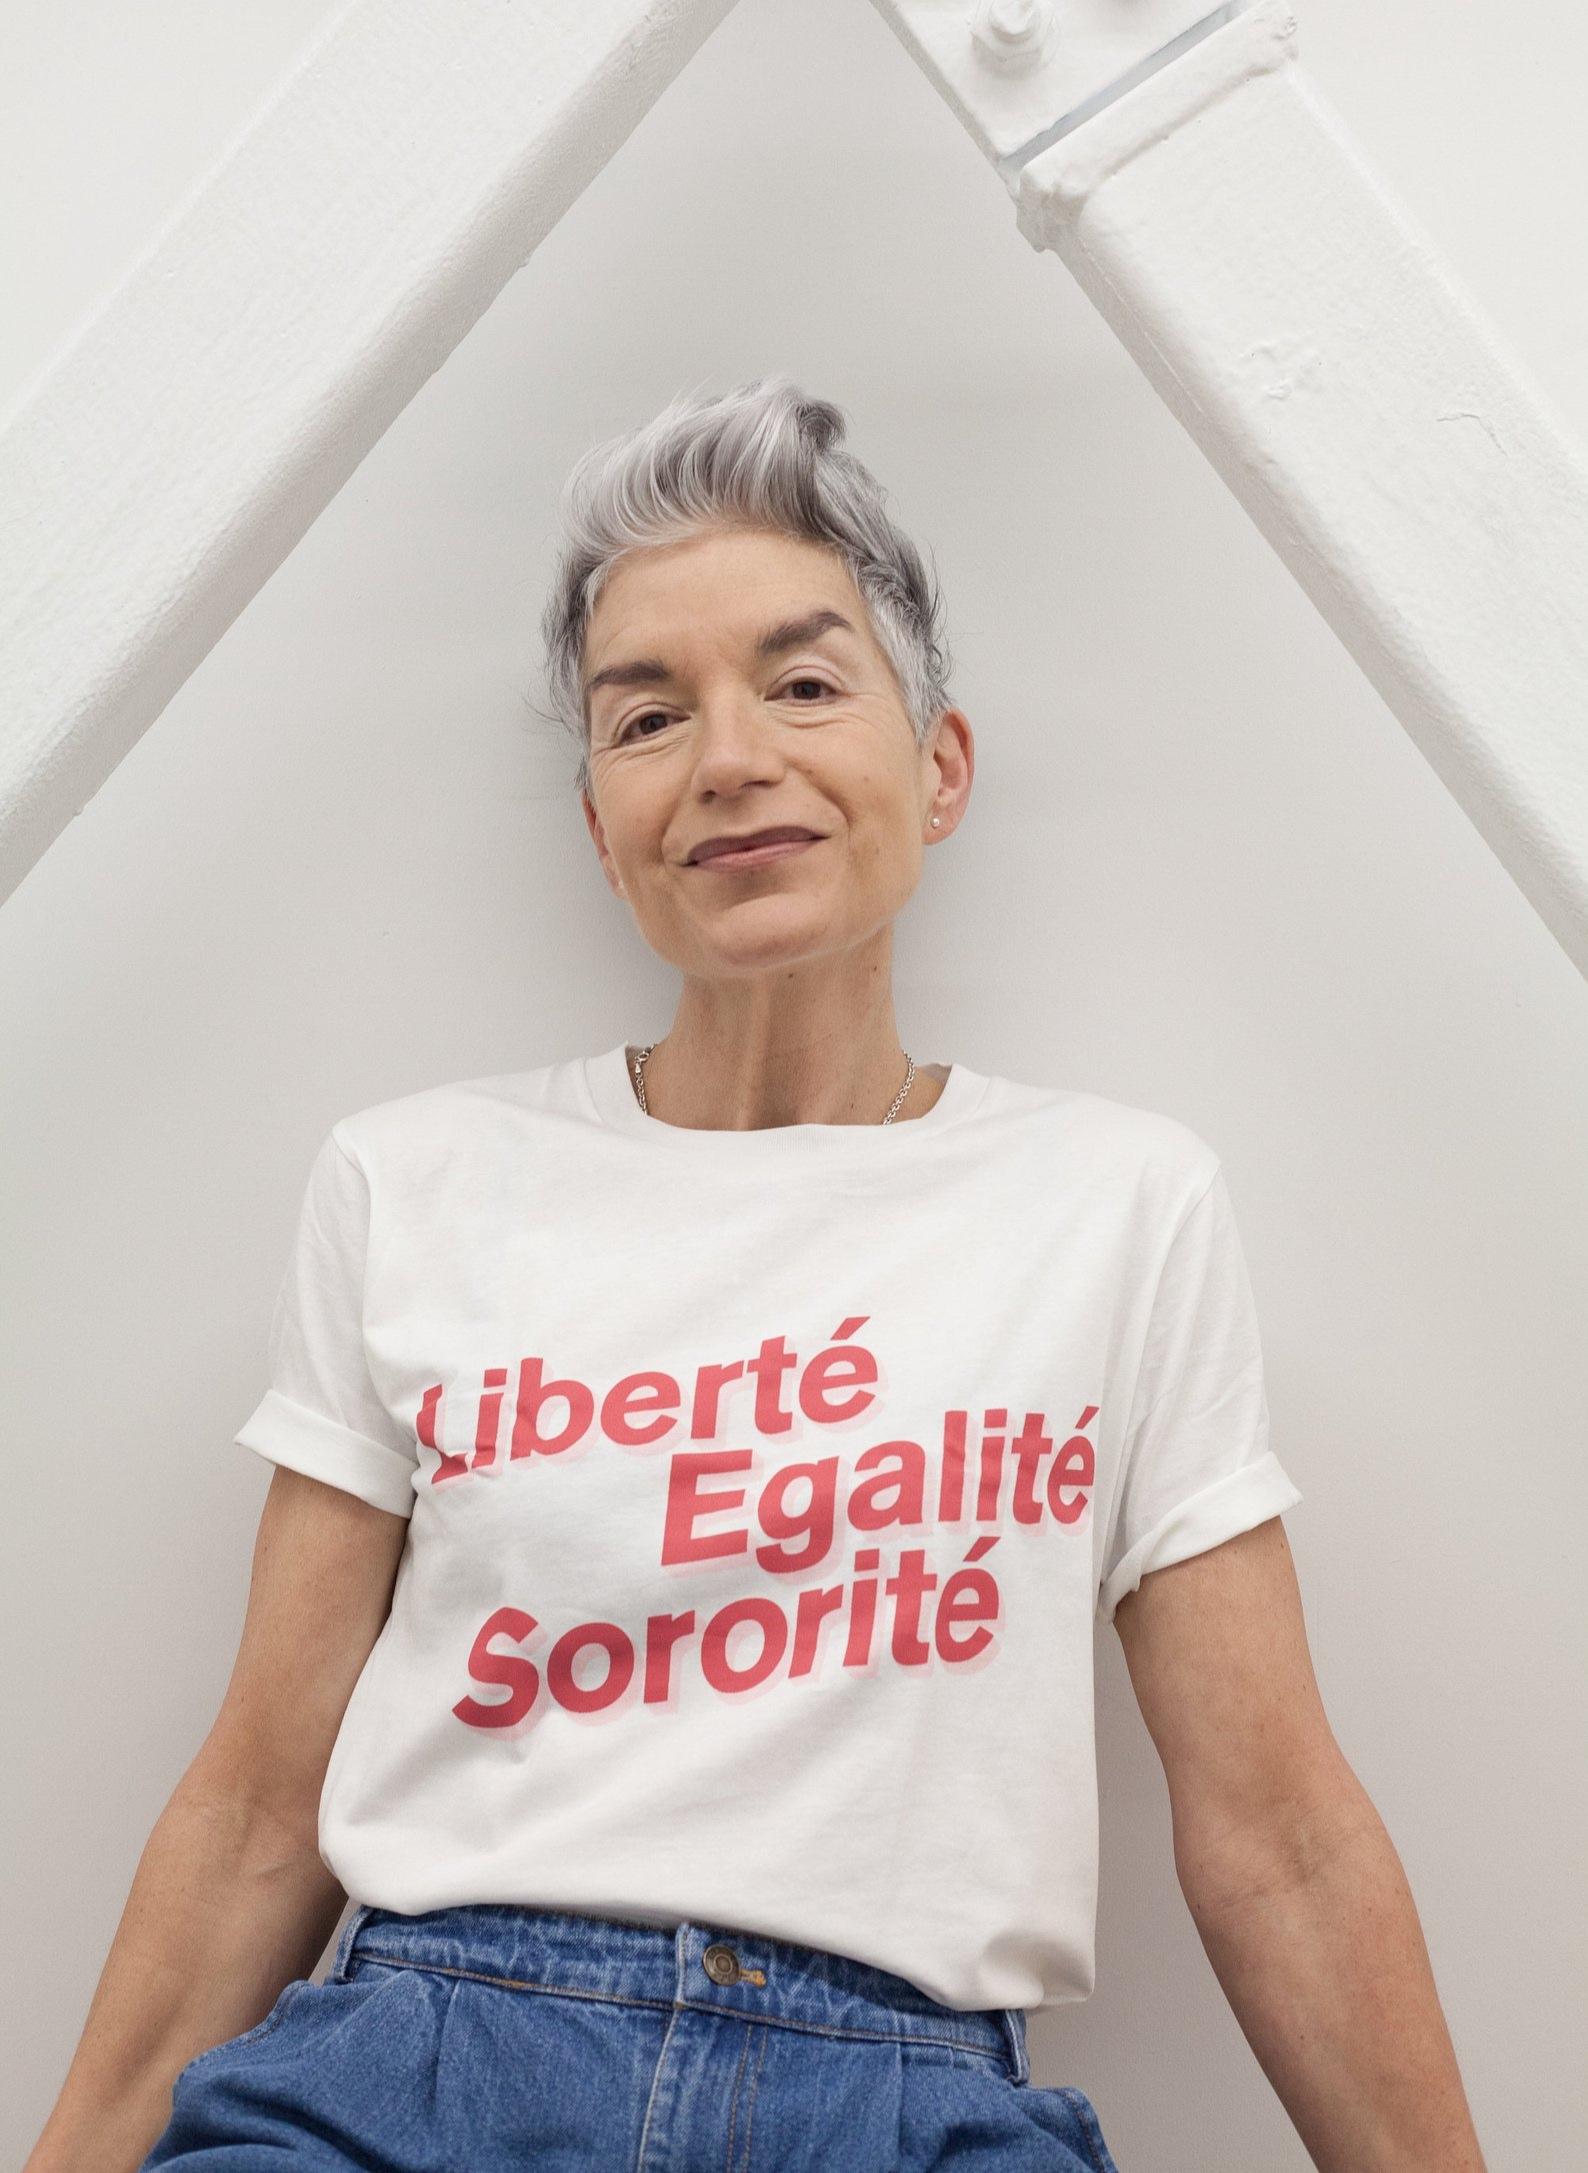 Liberté Egalité Sororité Organic Cotton Feminist T-Shirt By Black and Beech